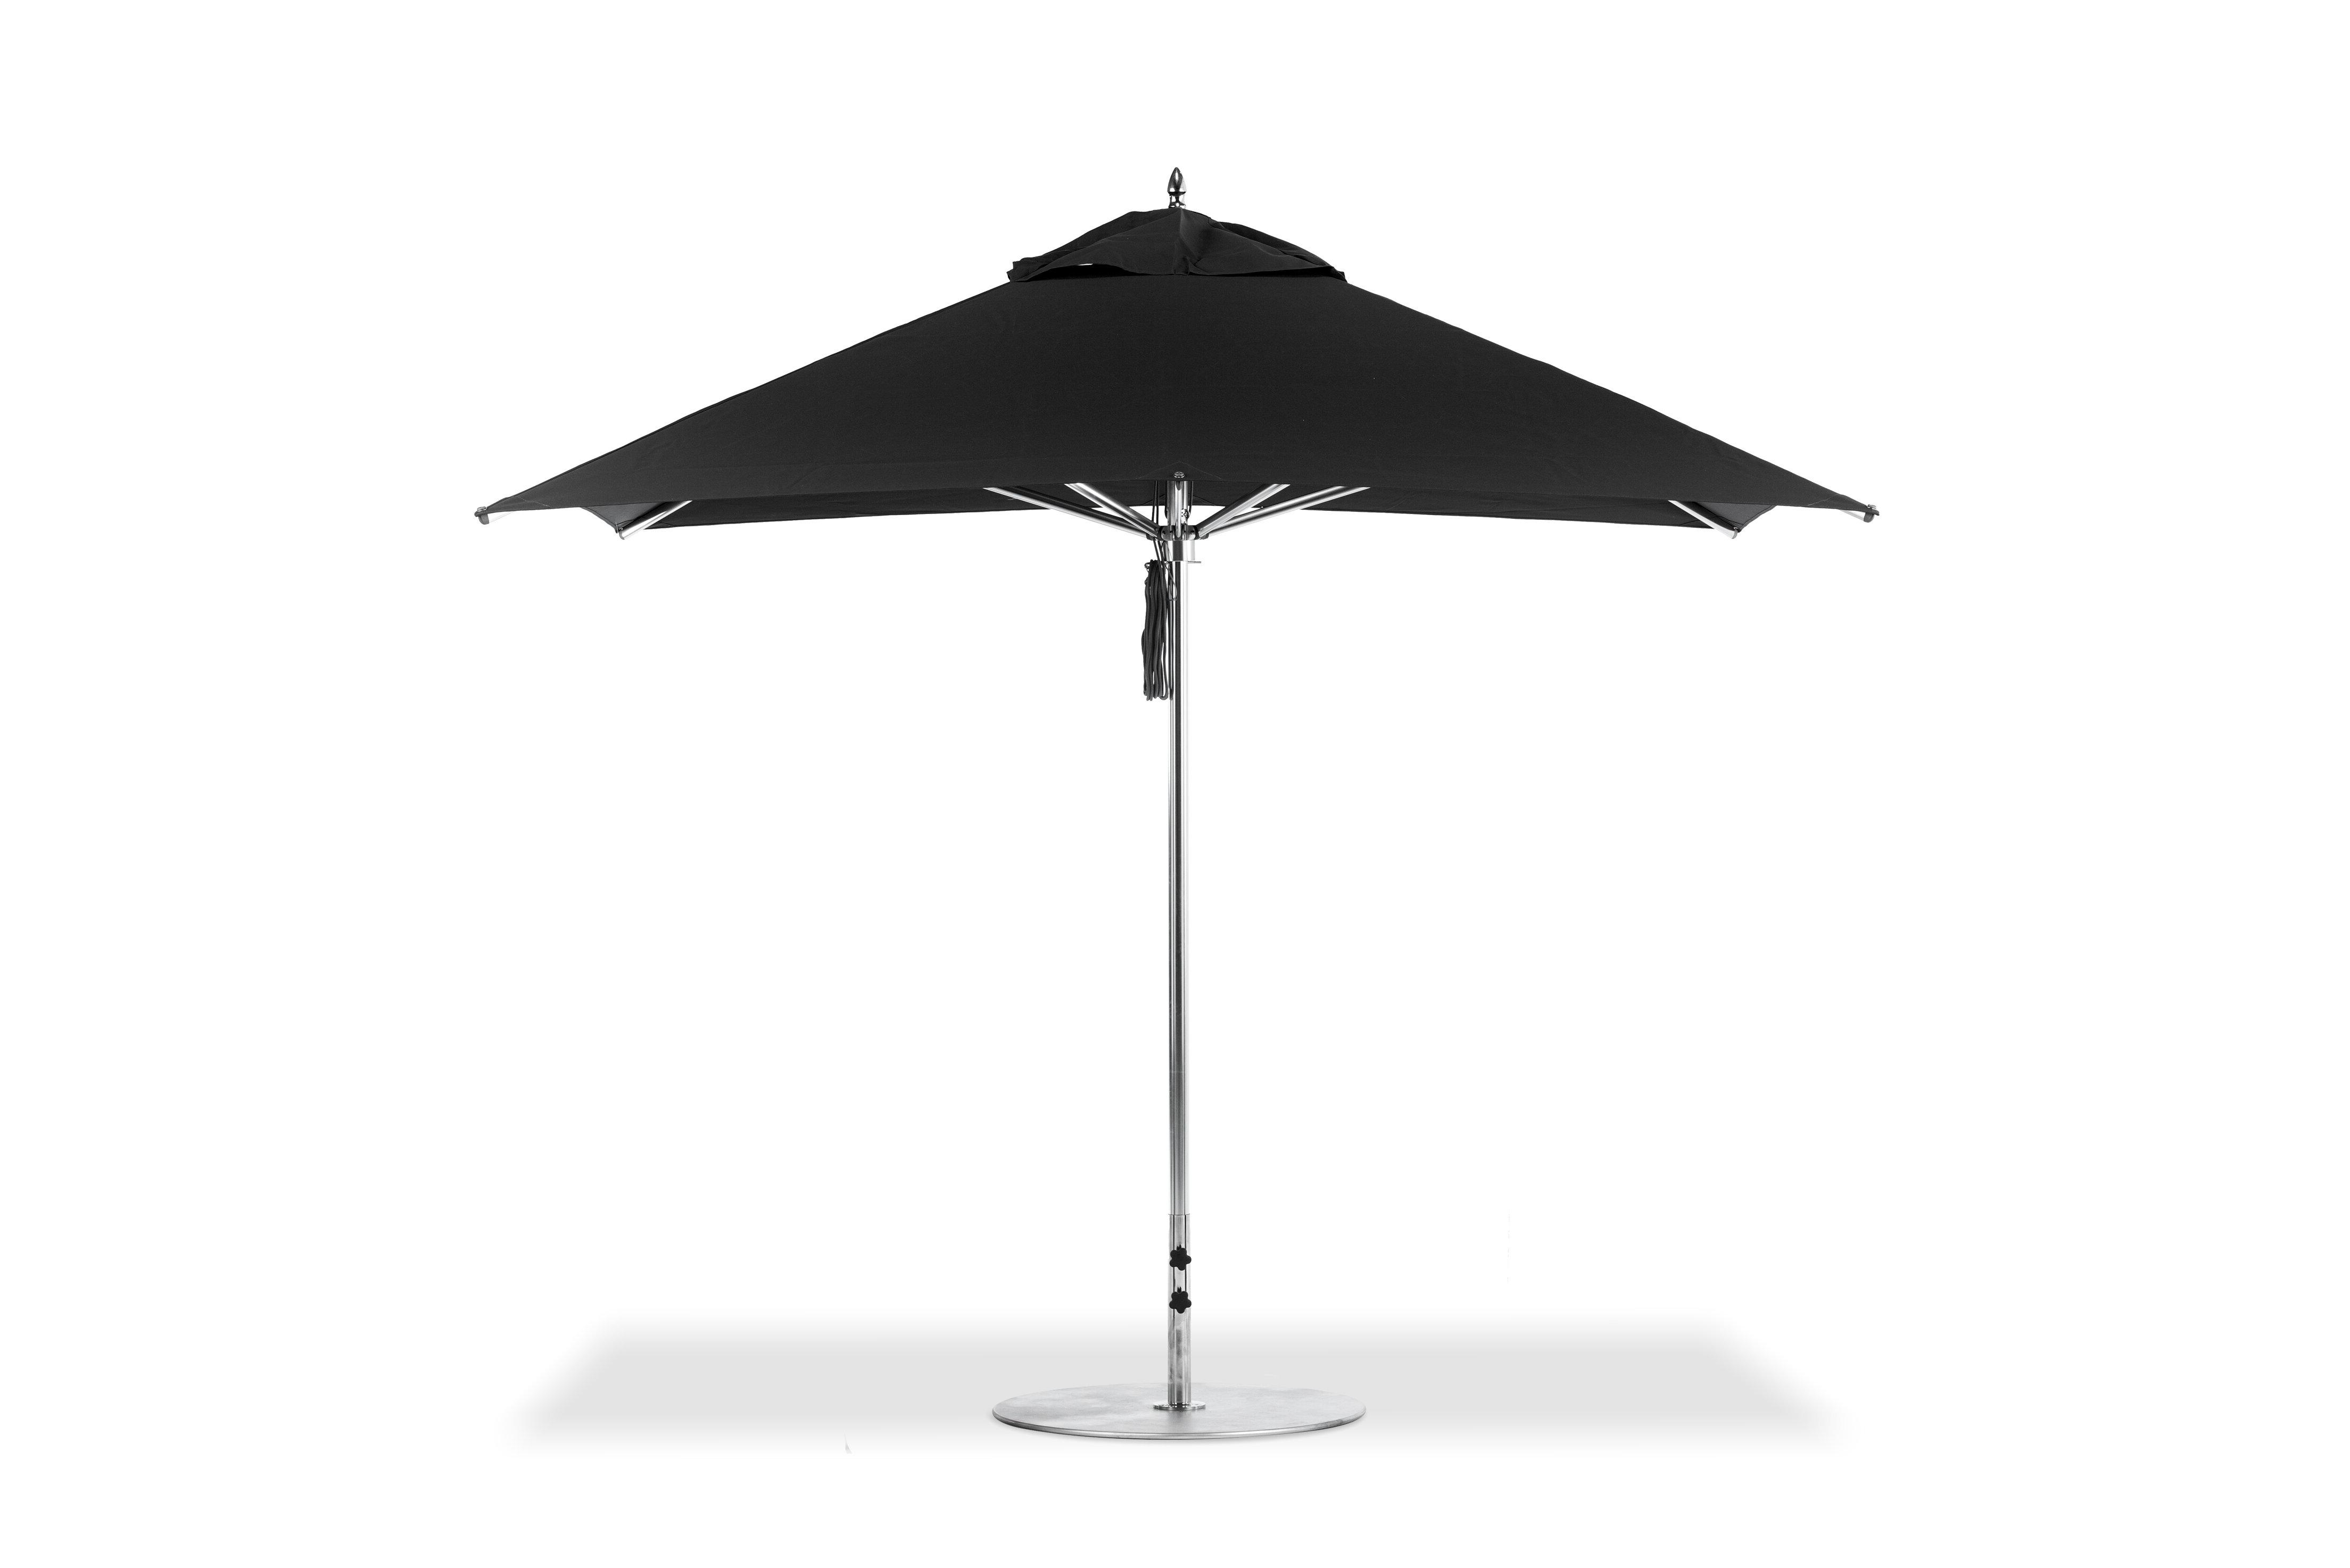 Well Liked Kavia 10' Square Market Umbrella With Regard To Zeman Market Umbrellas (View 13 of 20)